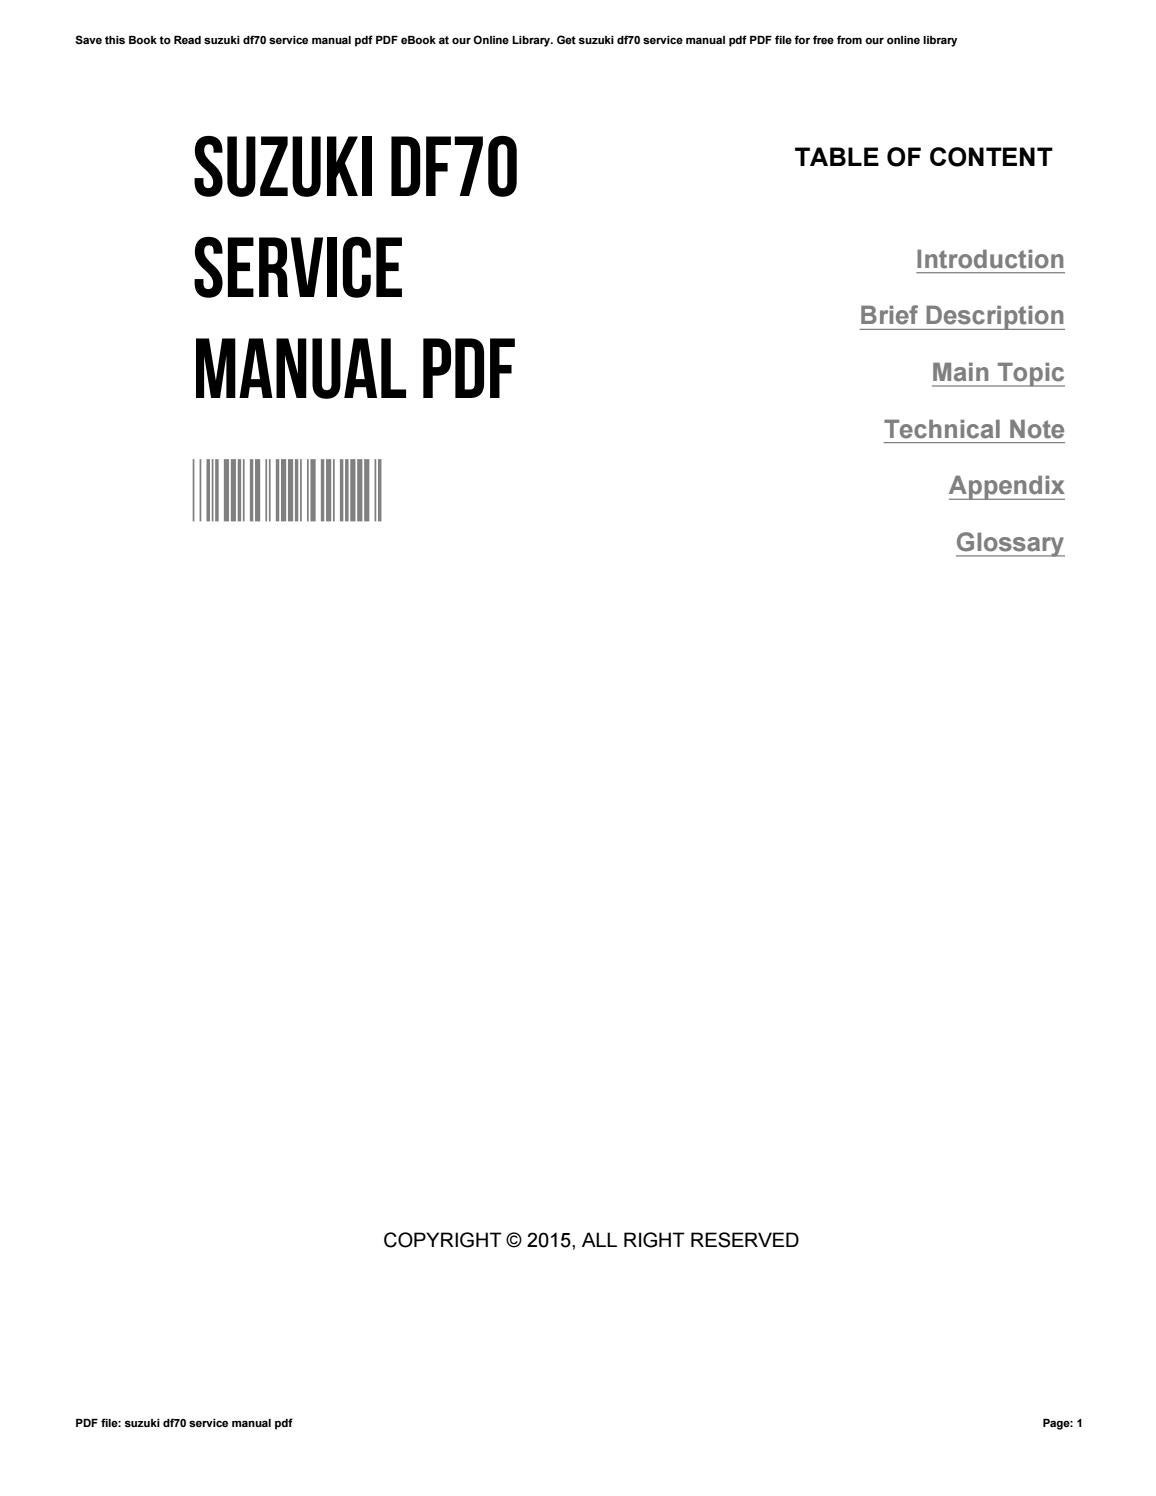 Suzuki df70a df80a df90a outboard motor service manual for sale.